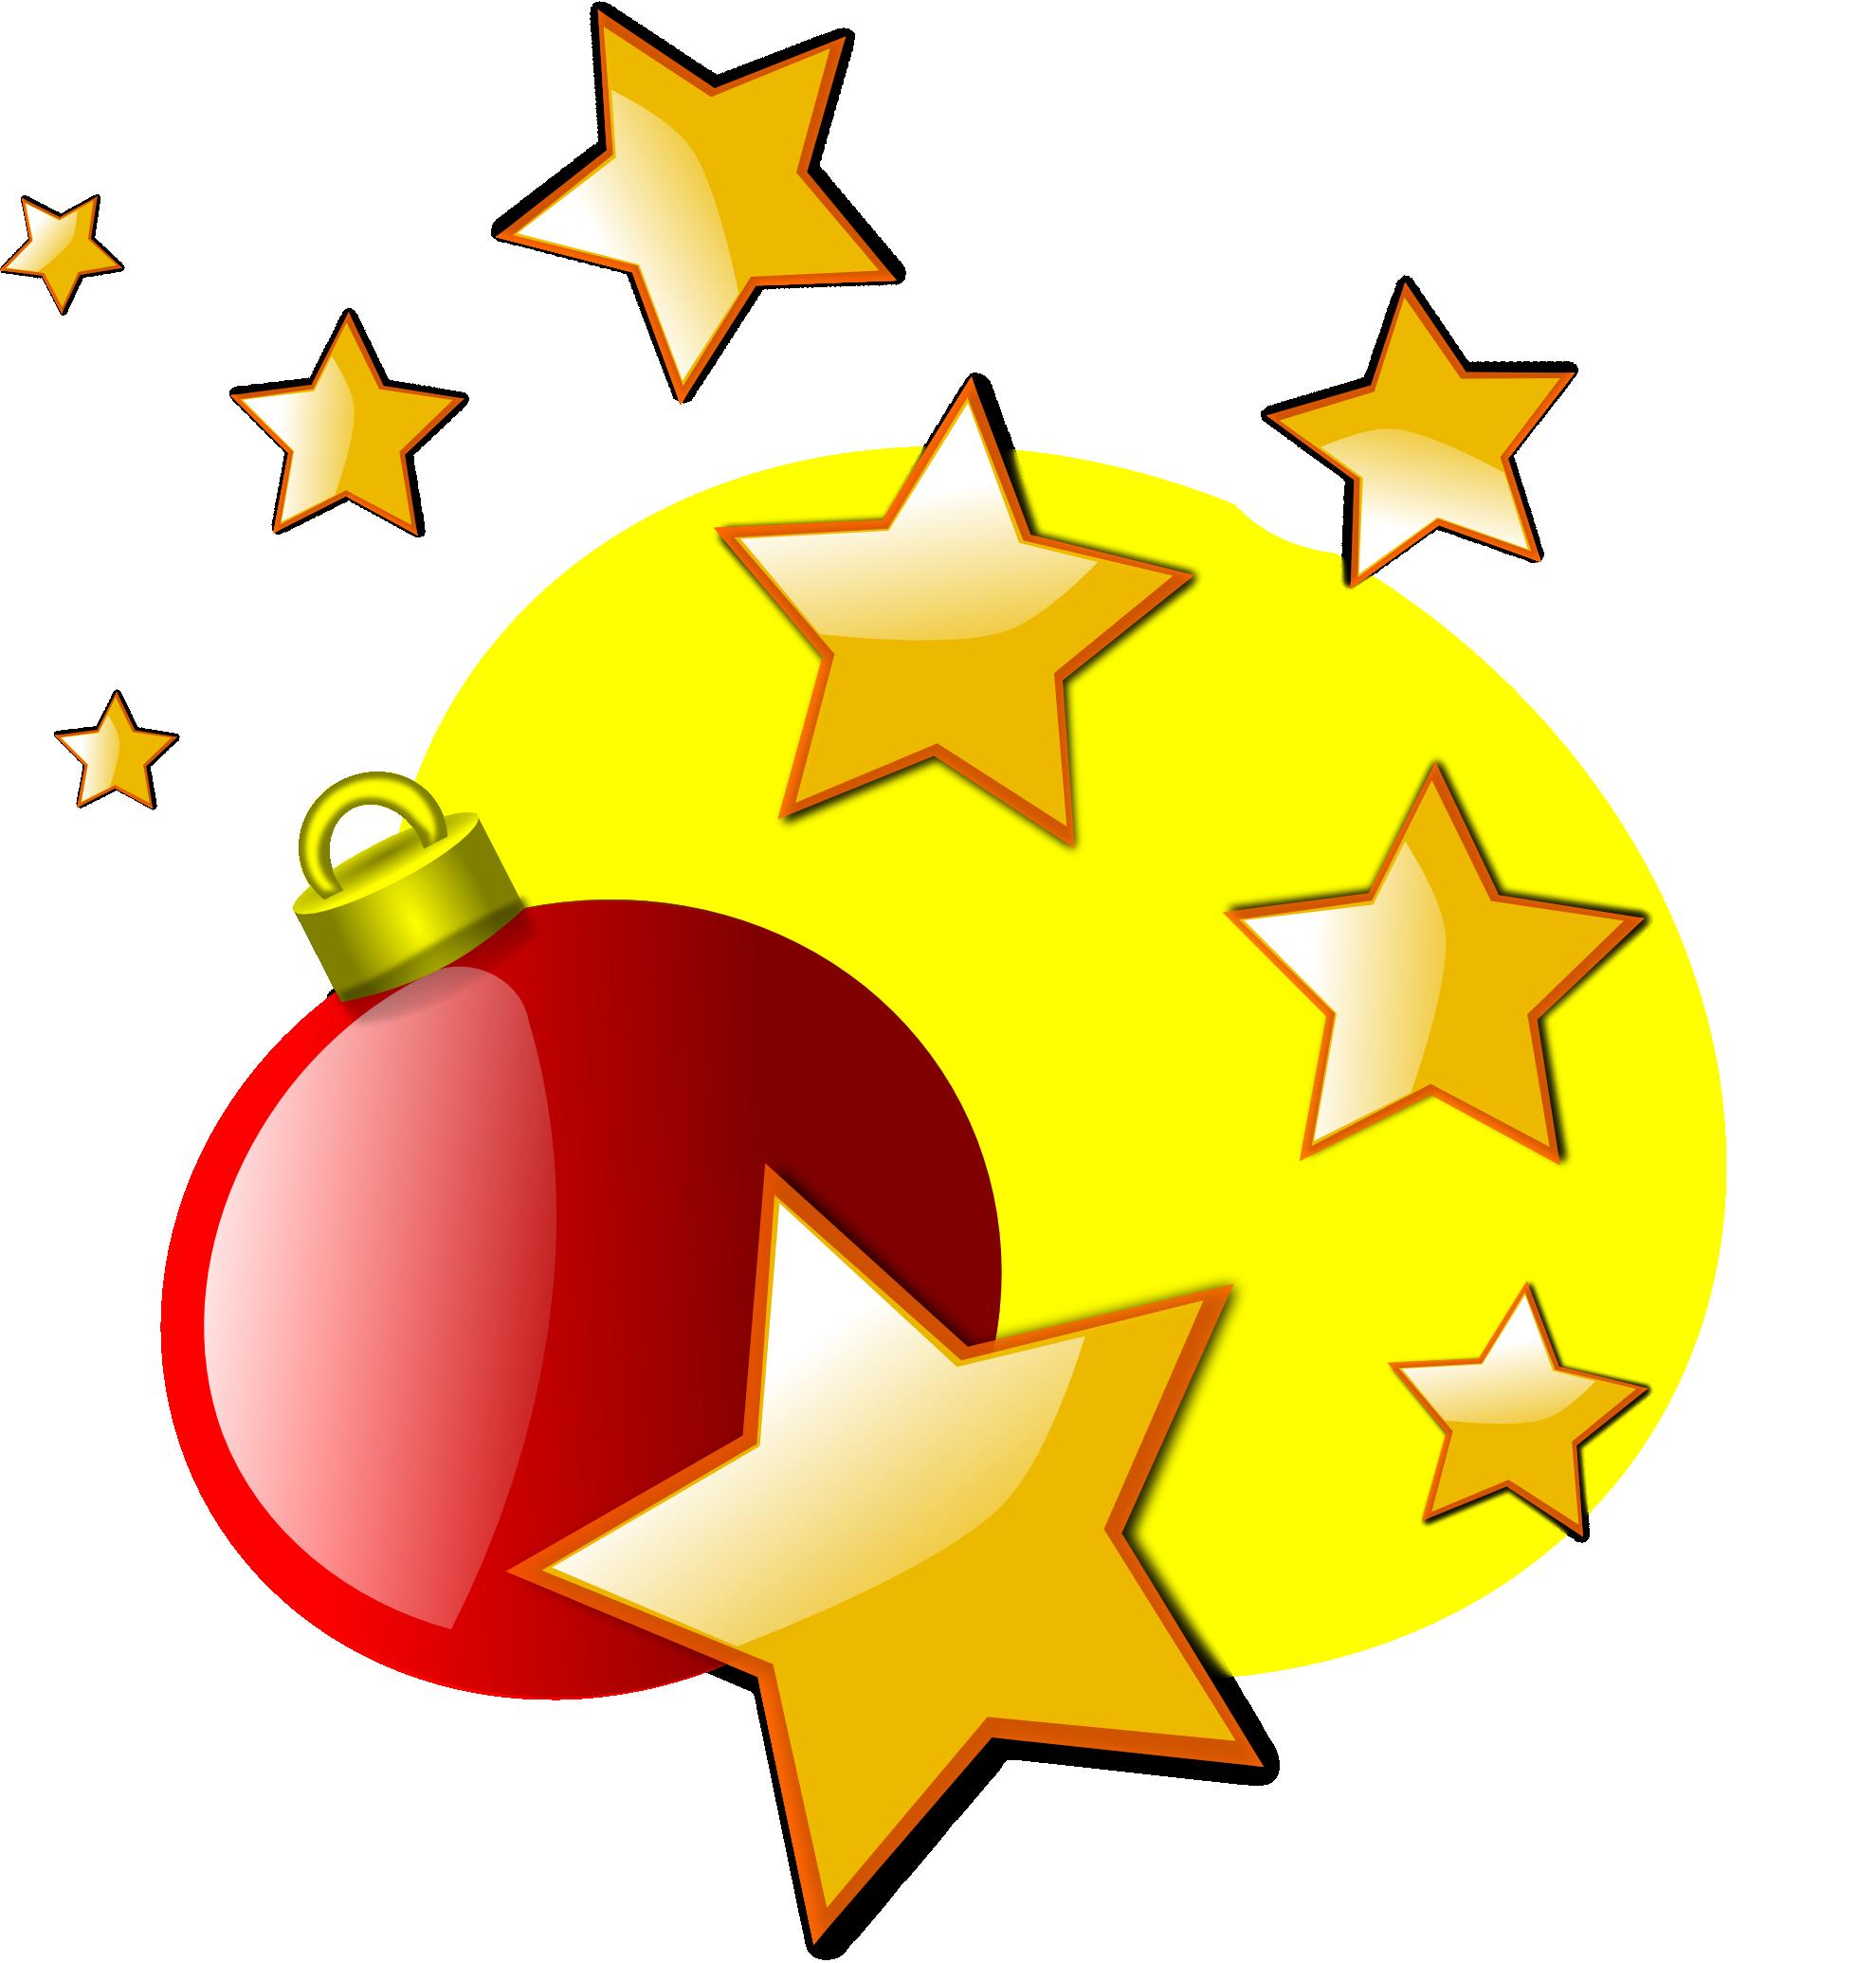 Clip Art Holiday Clipart Clipartbold 2-Clip art holiday clipart clipartbold 2-1